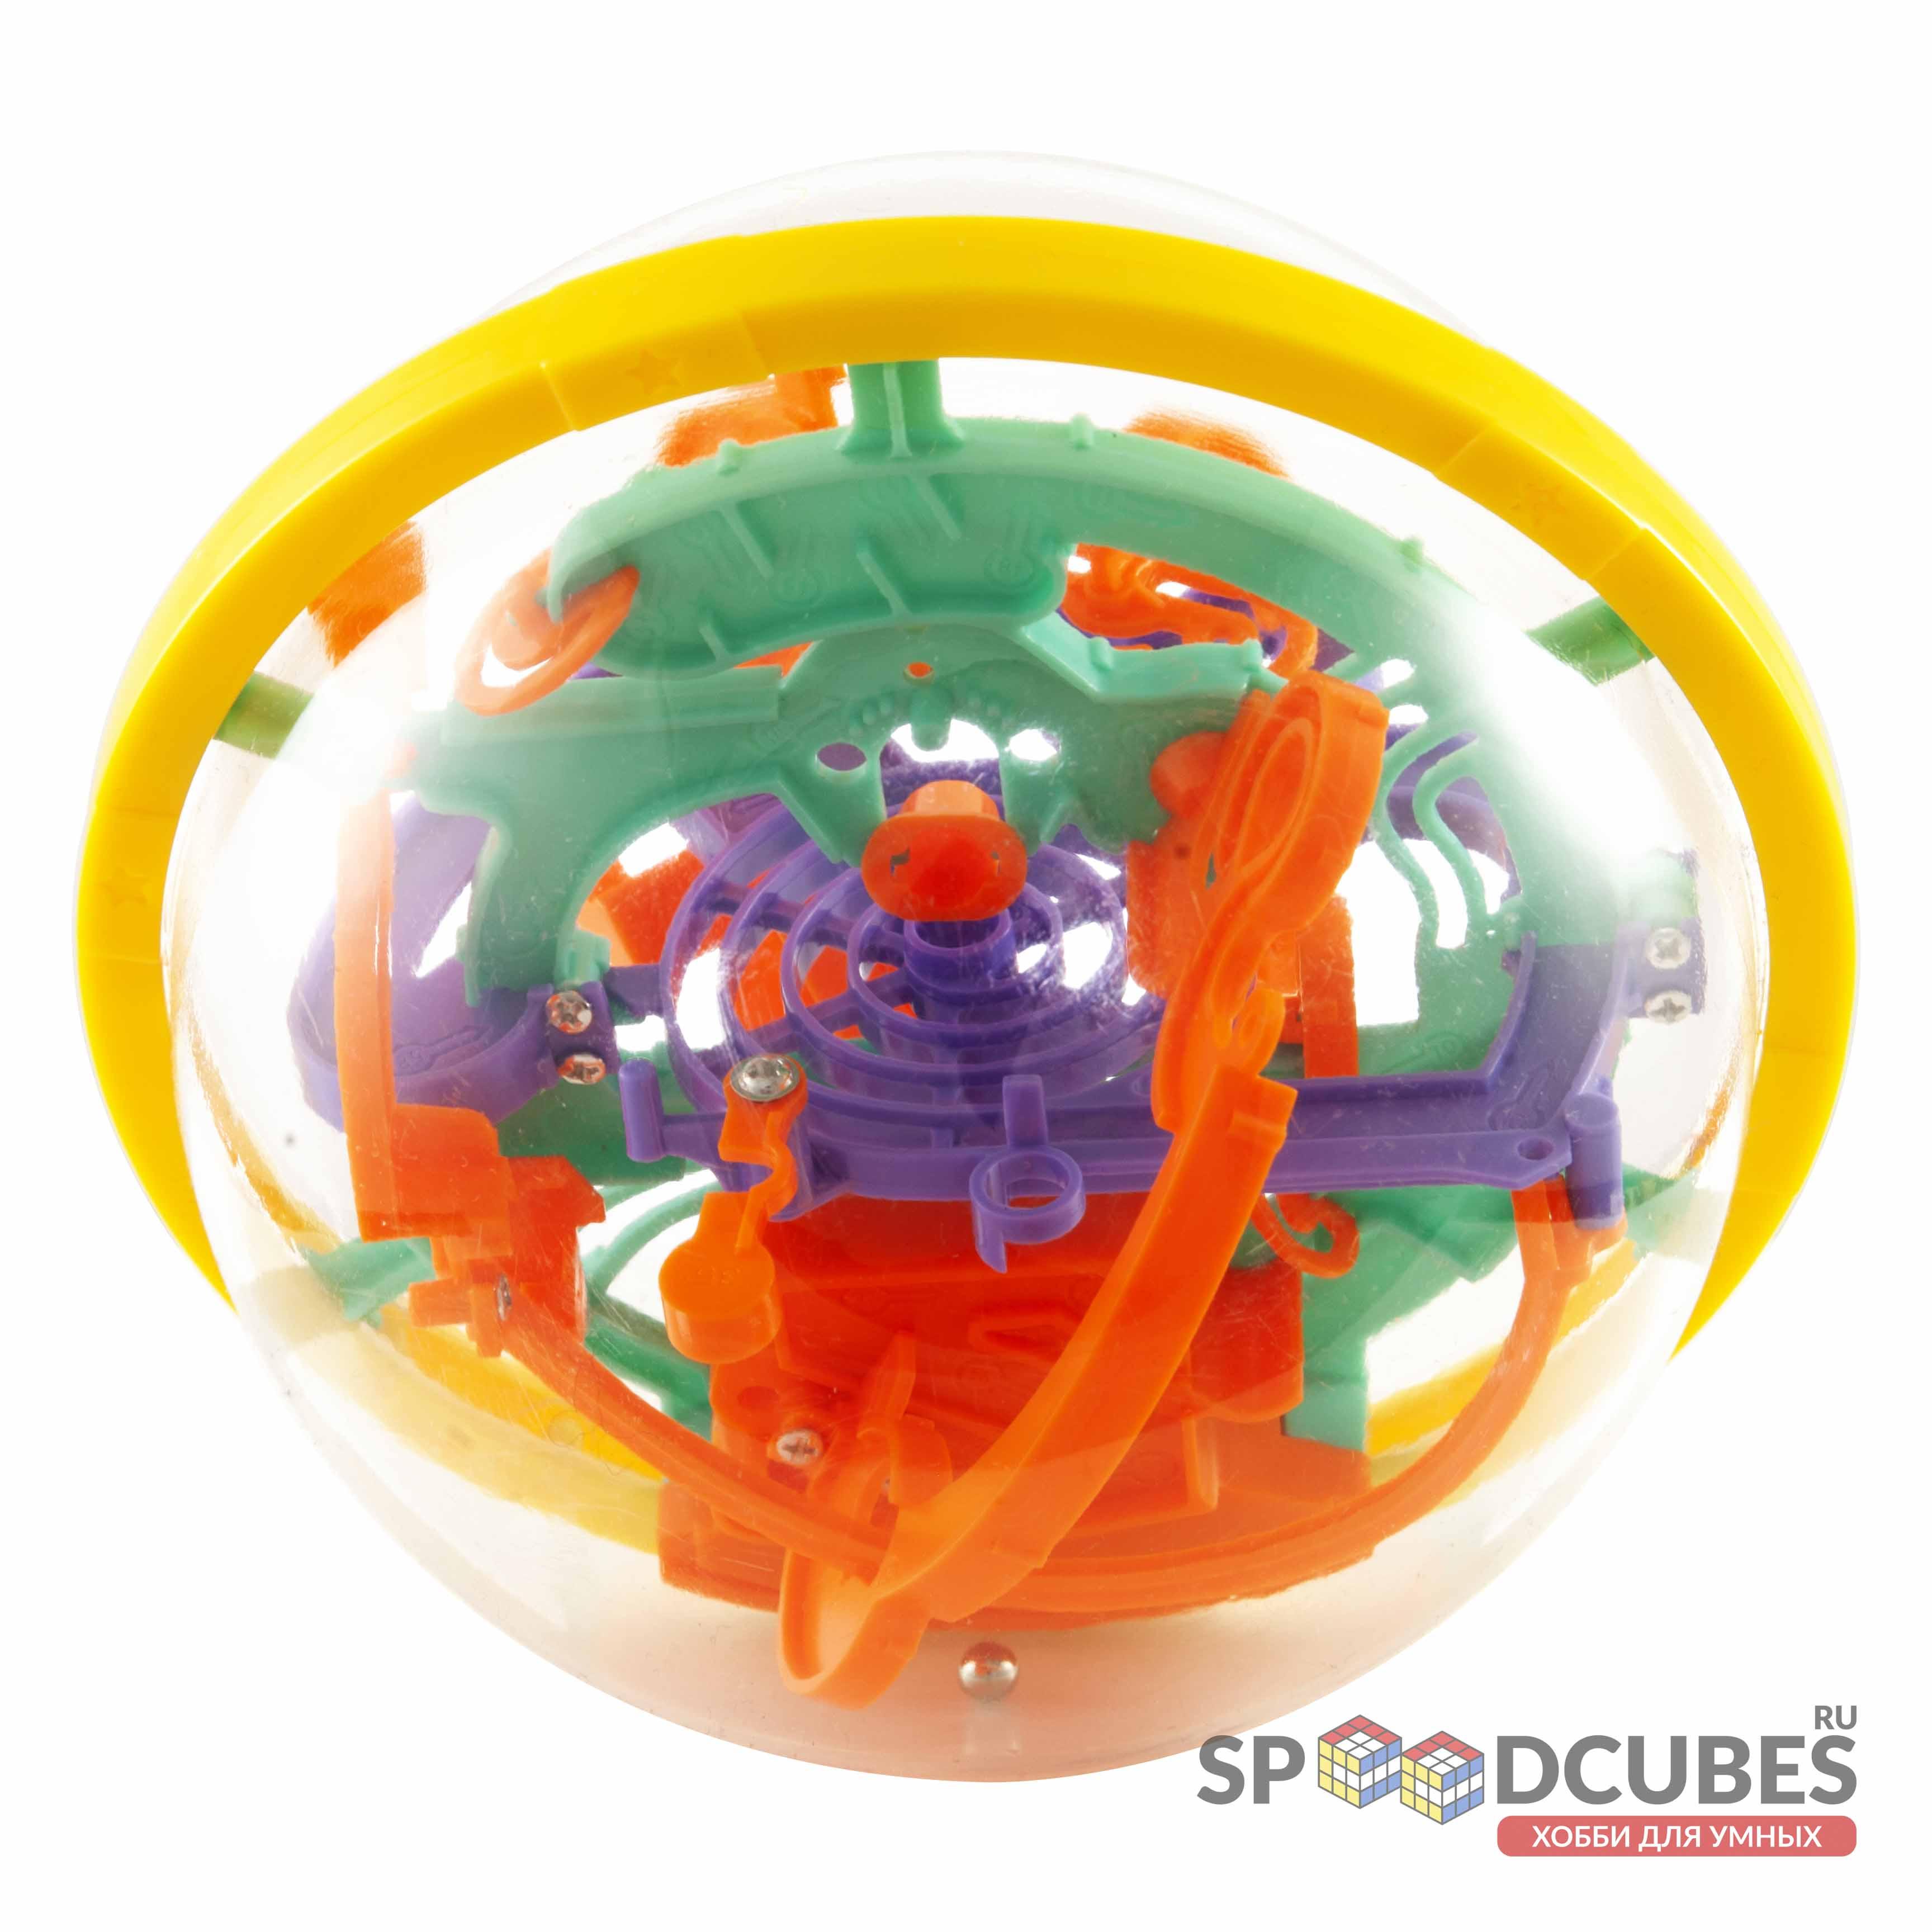 Шар-лабиринт YuXin YuXin Space Ball Bearing Maze Game